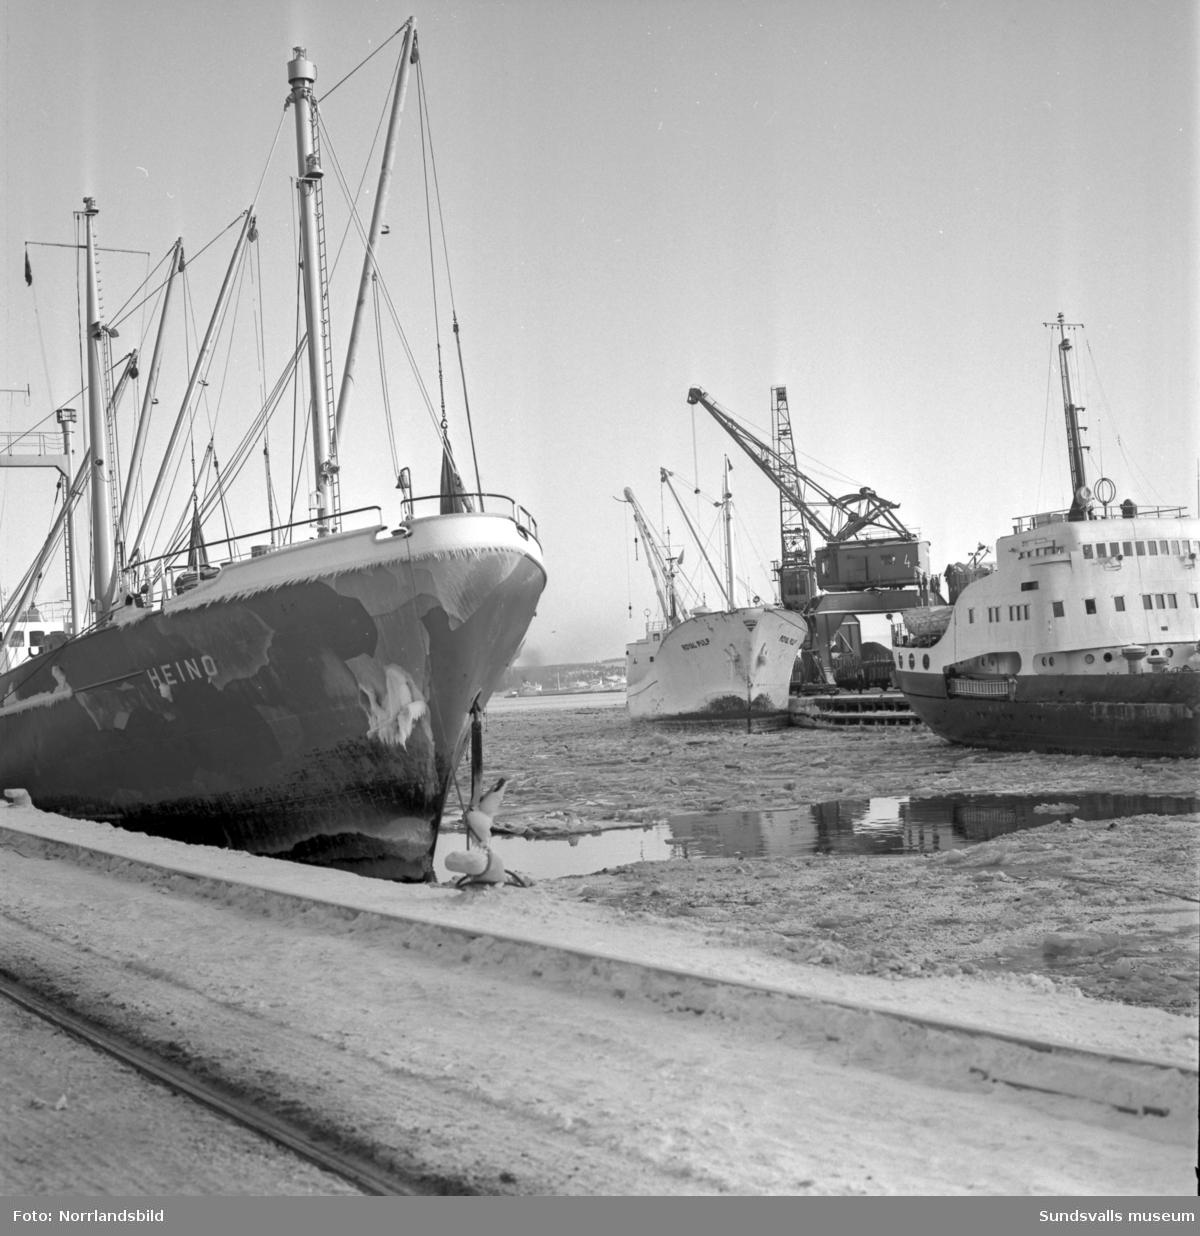 Isiga båtar i januarikylan i Sundsvalls hamn. Hilda Wesch, Heino.